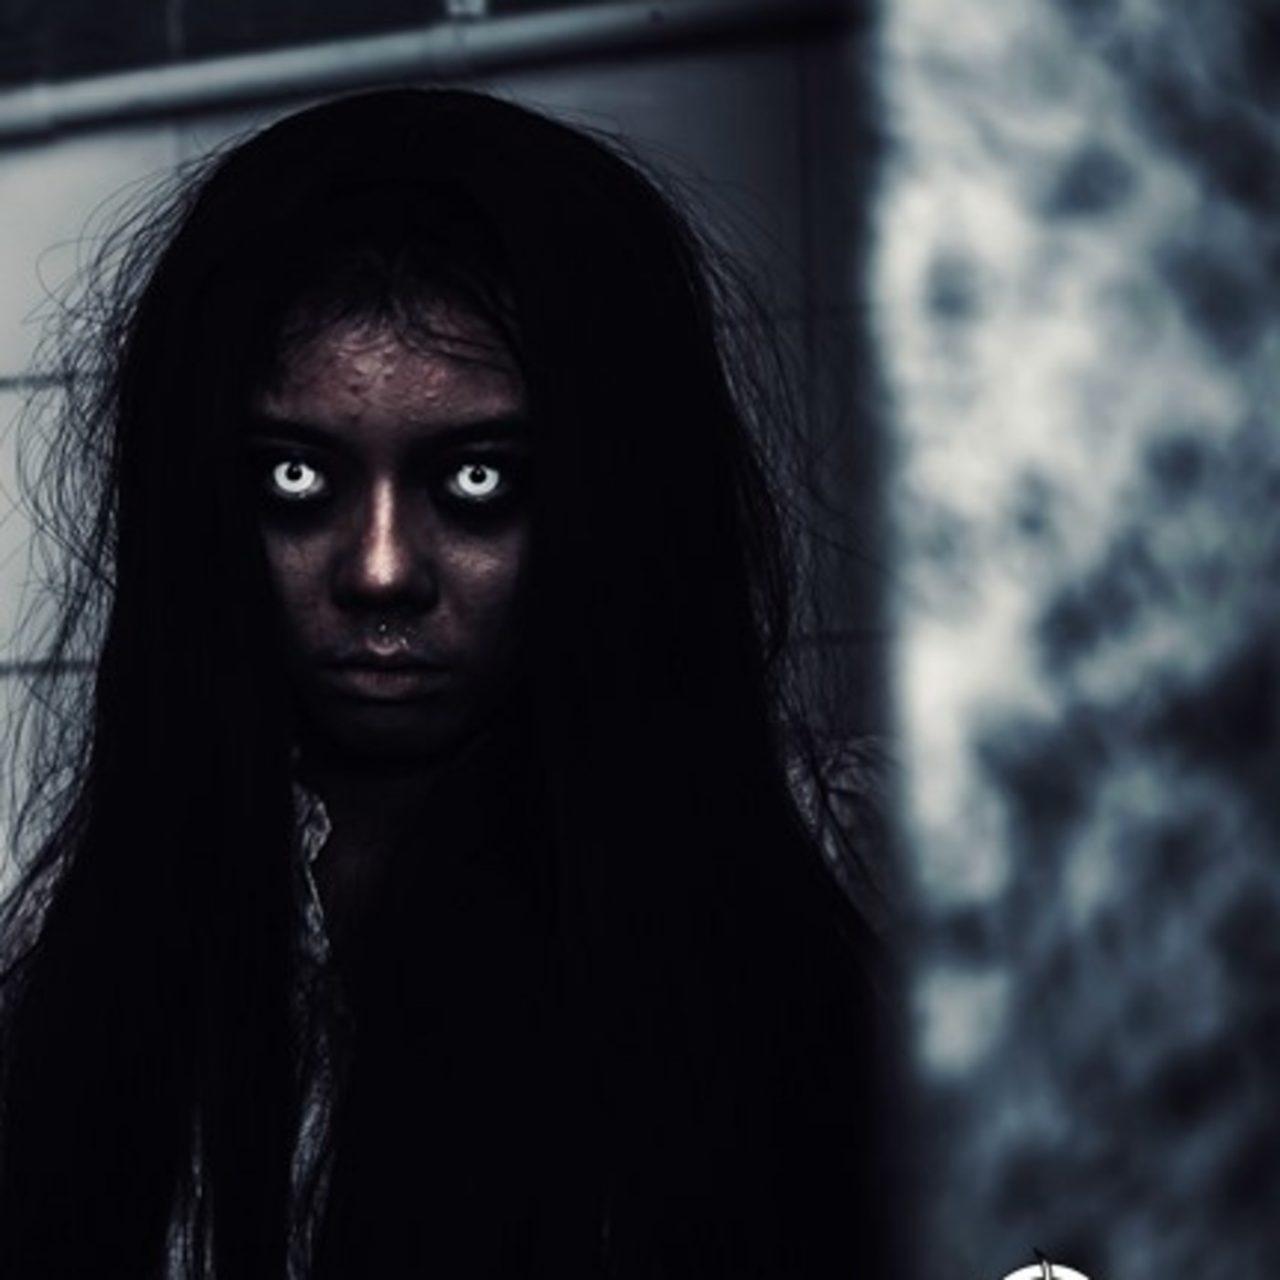 La niña fantasma que salió del espejo